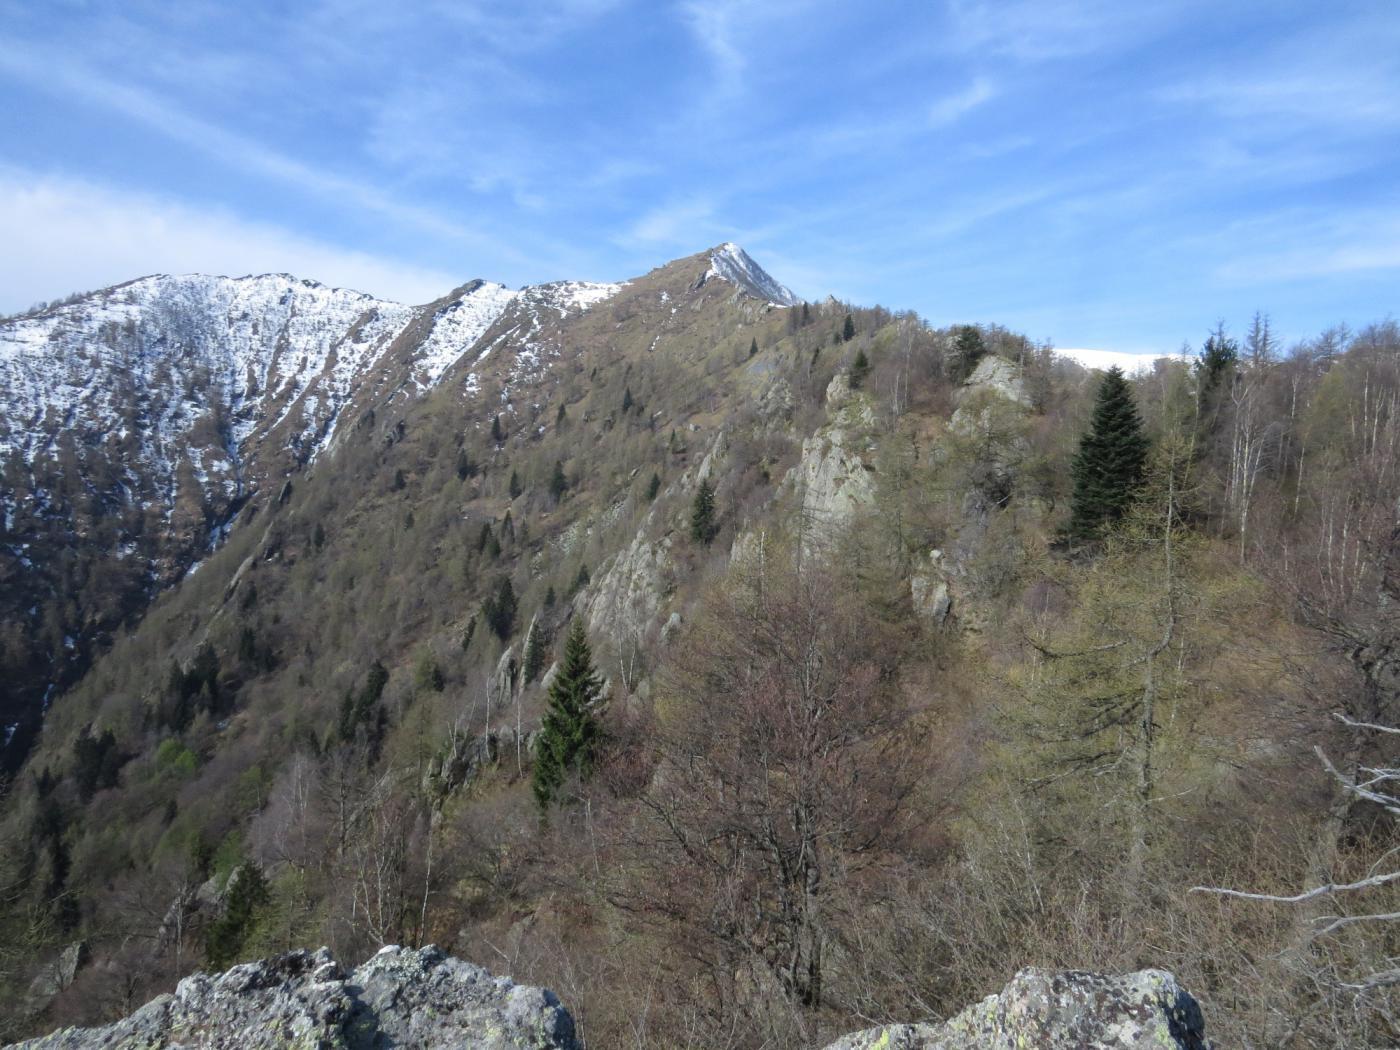 L'Uja d'Ingria, vista dal Monte Serena